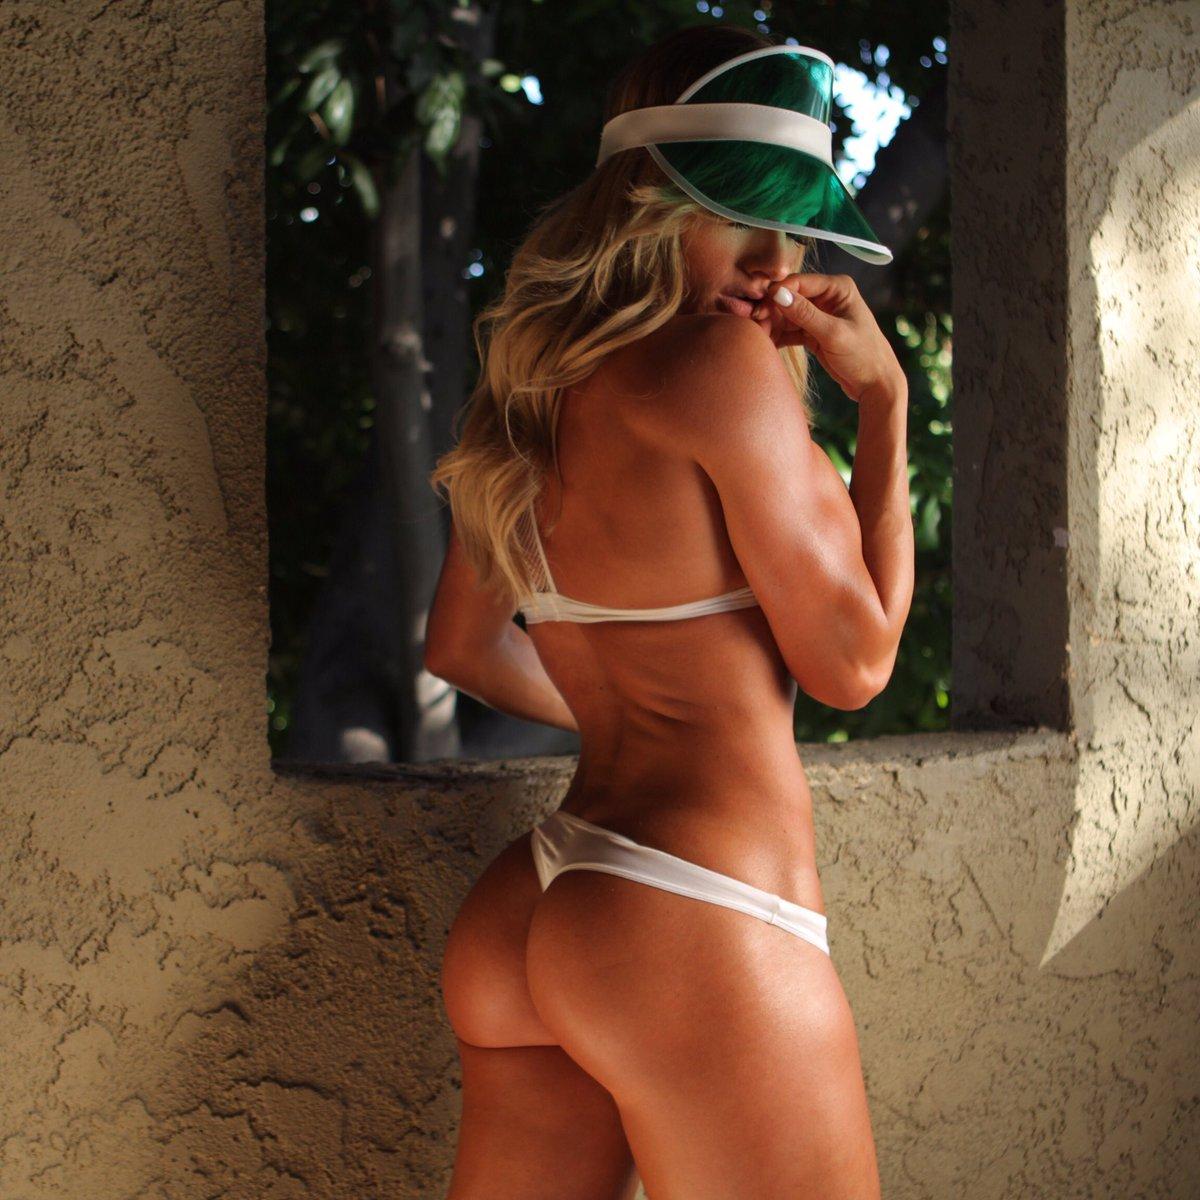 paige hathaway nude